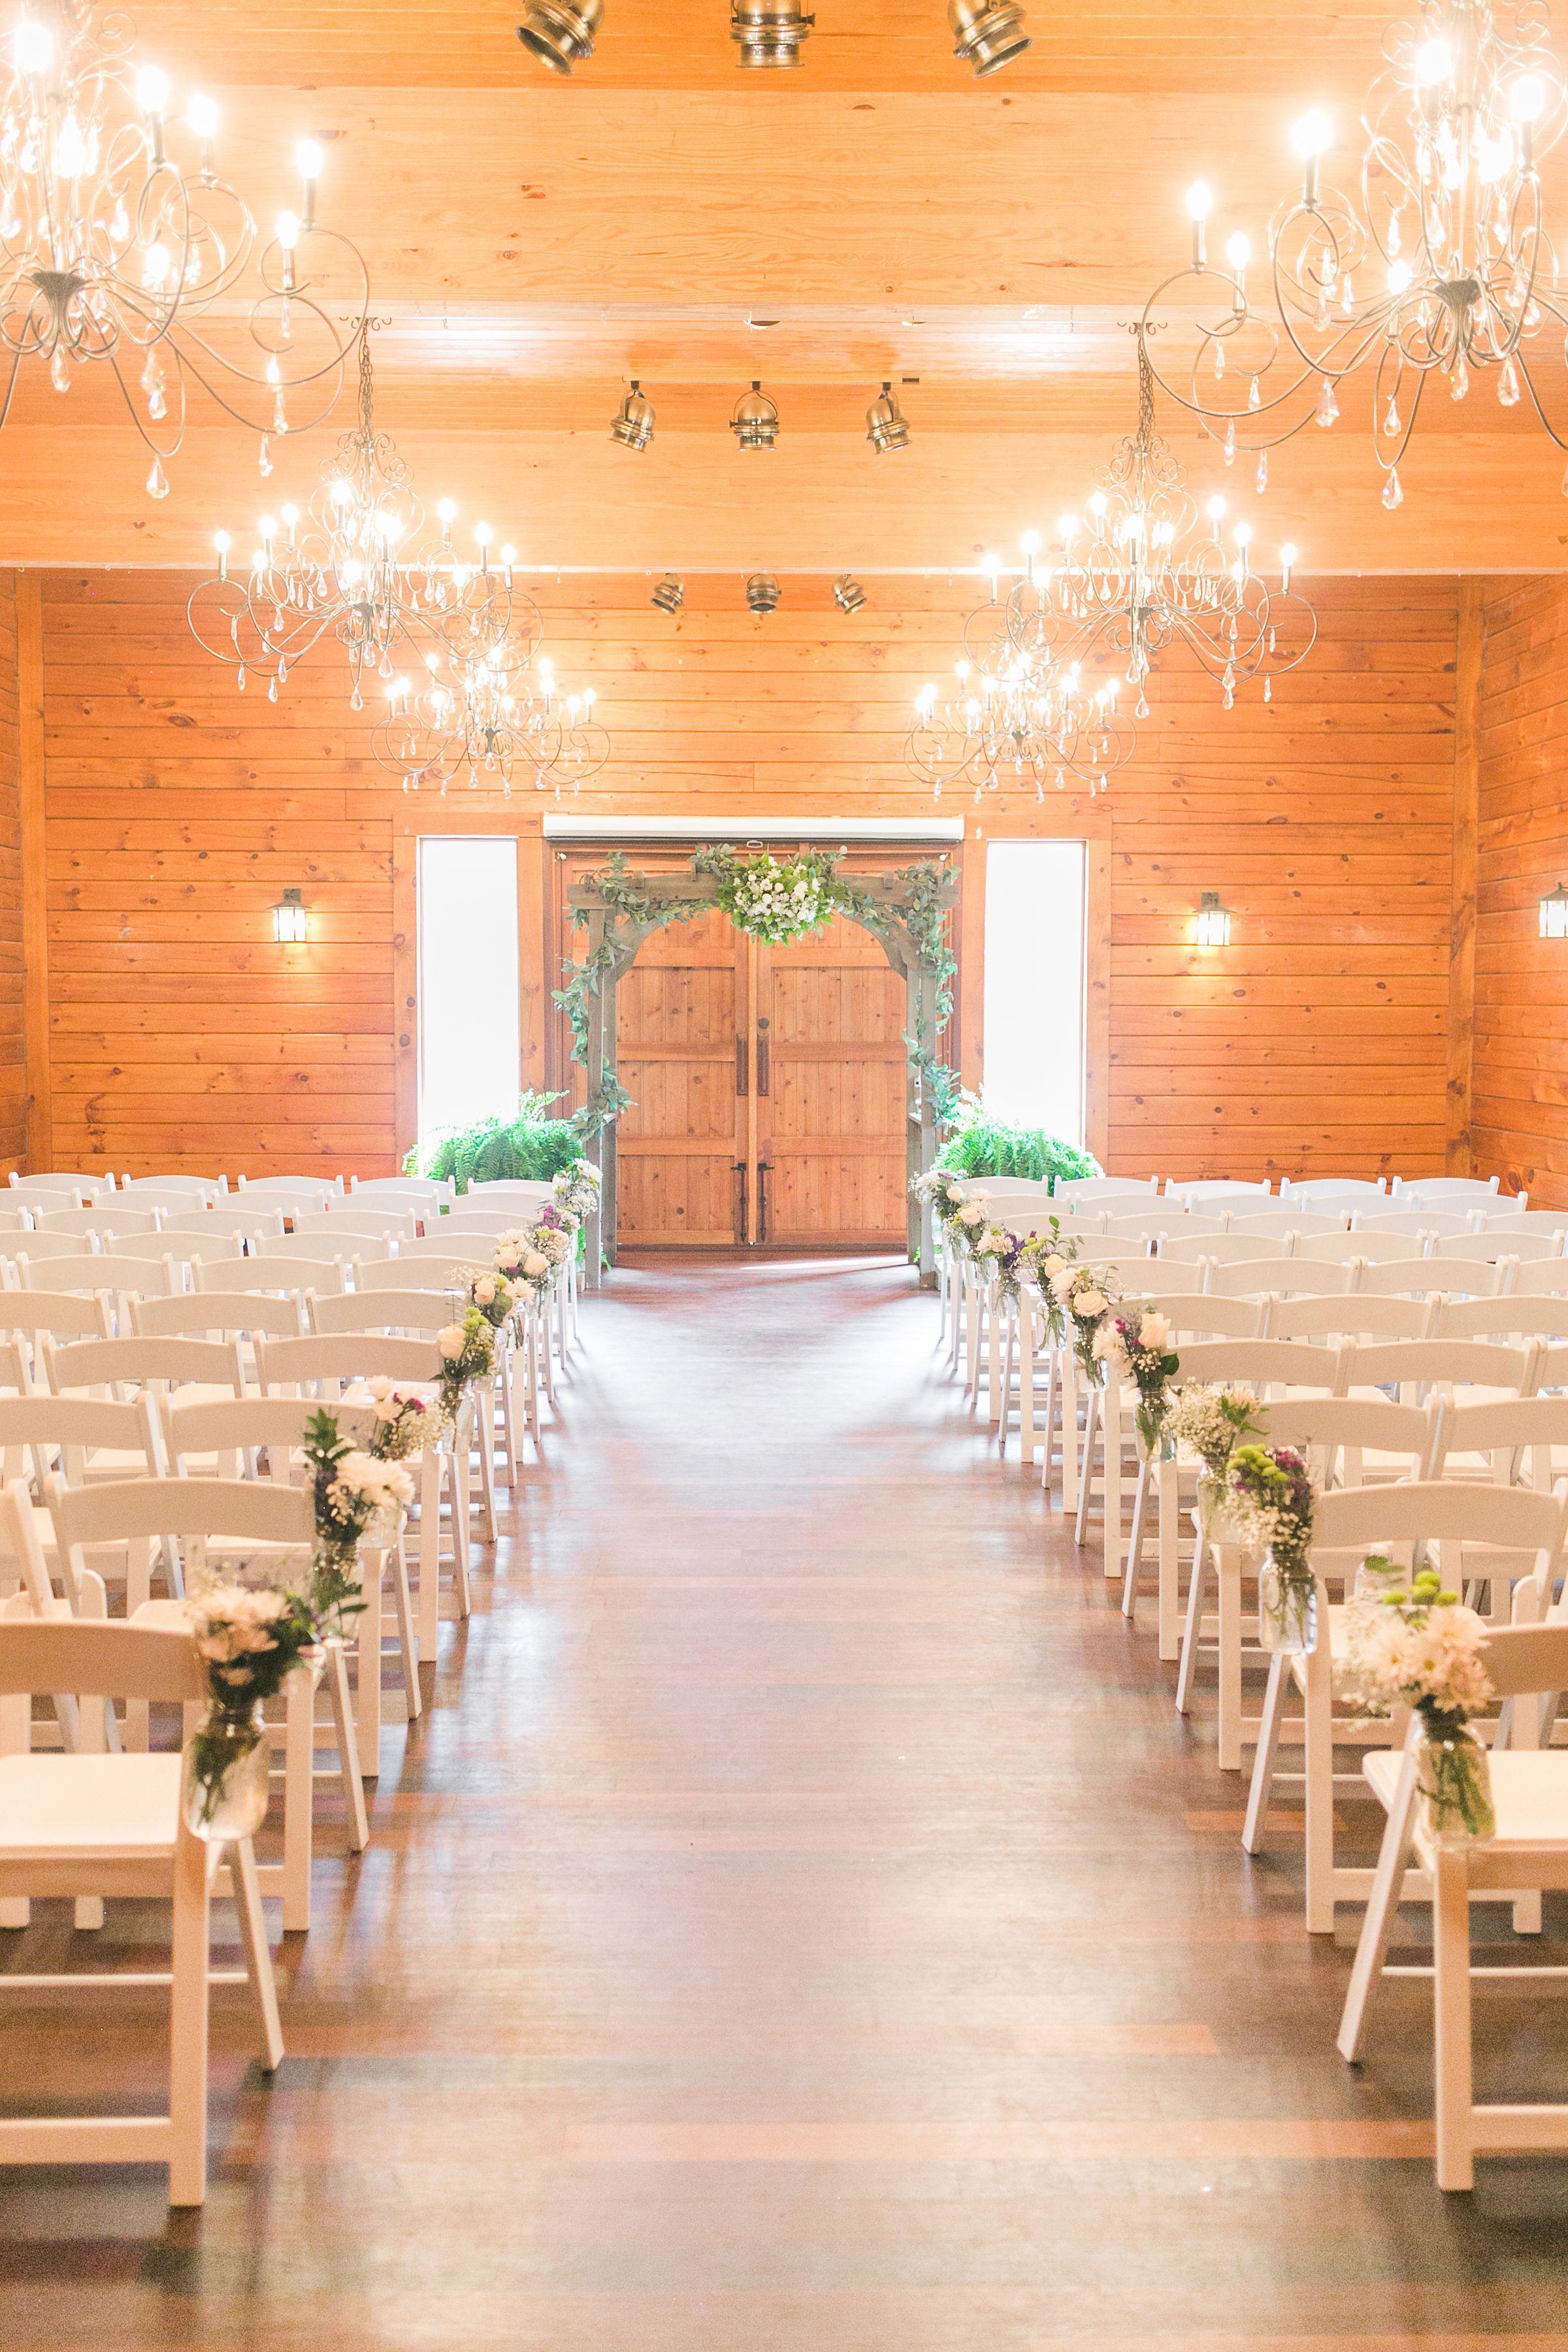 The Barn at Valhalla | Wedding graphics, Valhalla, Barn ...